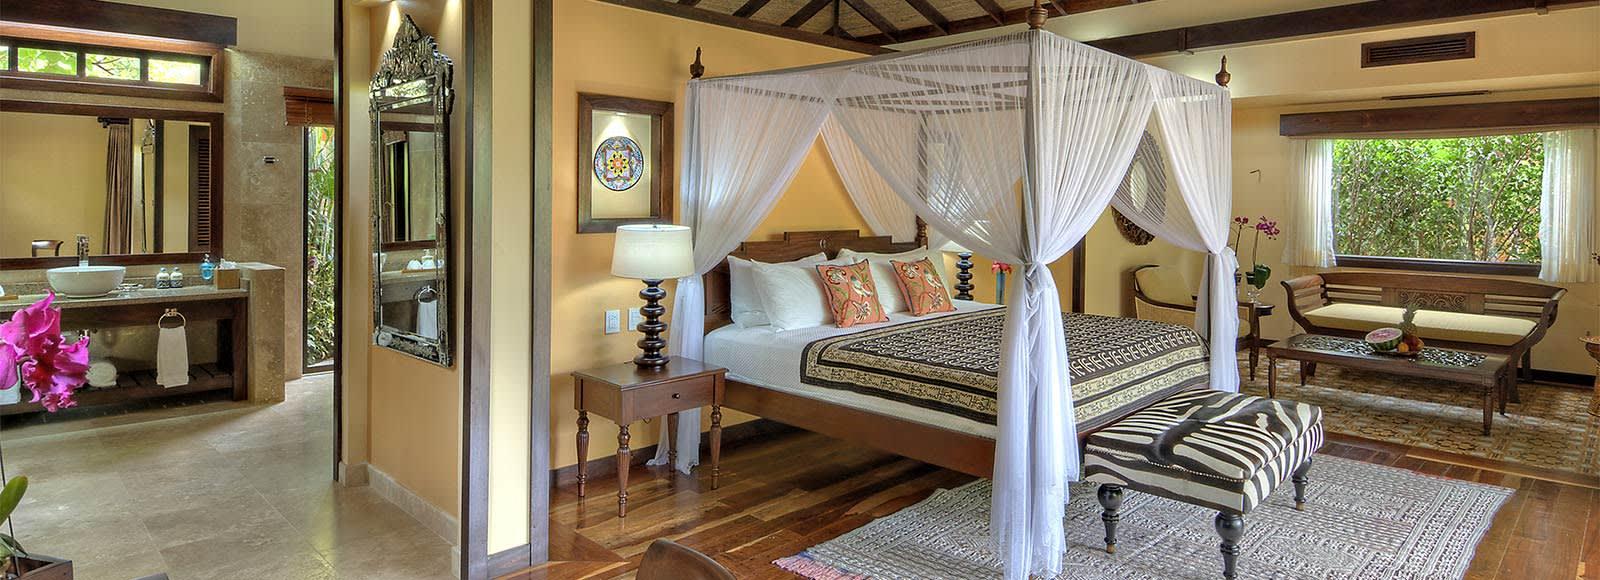 (照片來源:Nayara Springs Hotel官網https://goo.gl/JWZc93)